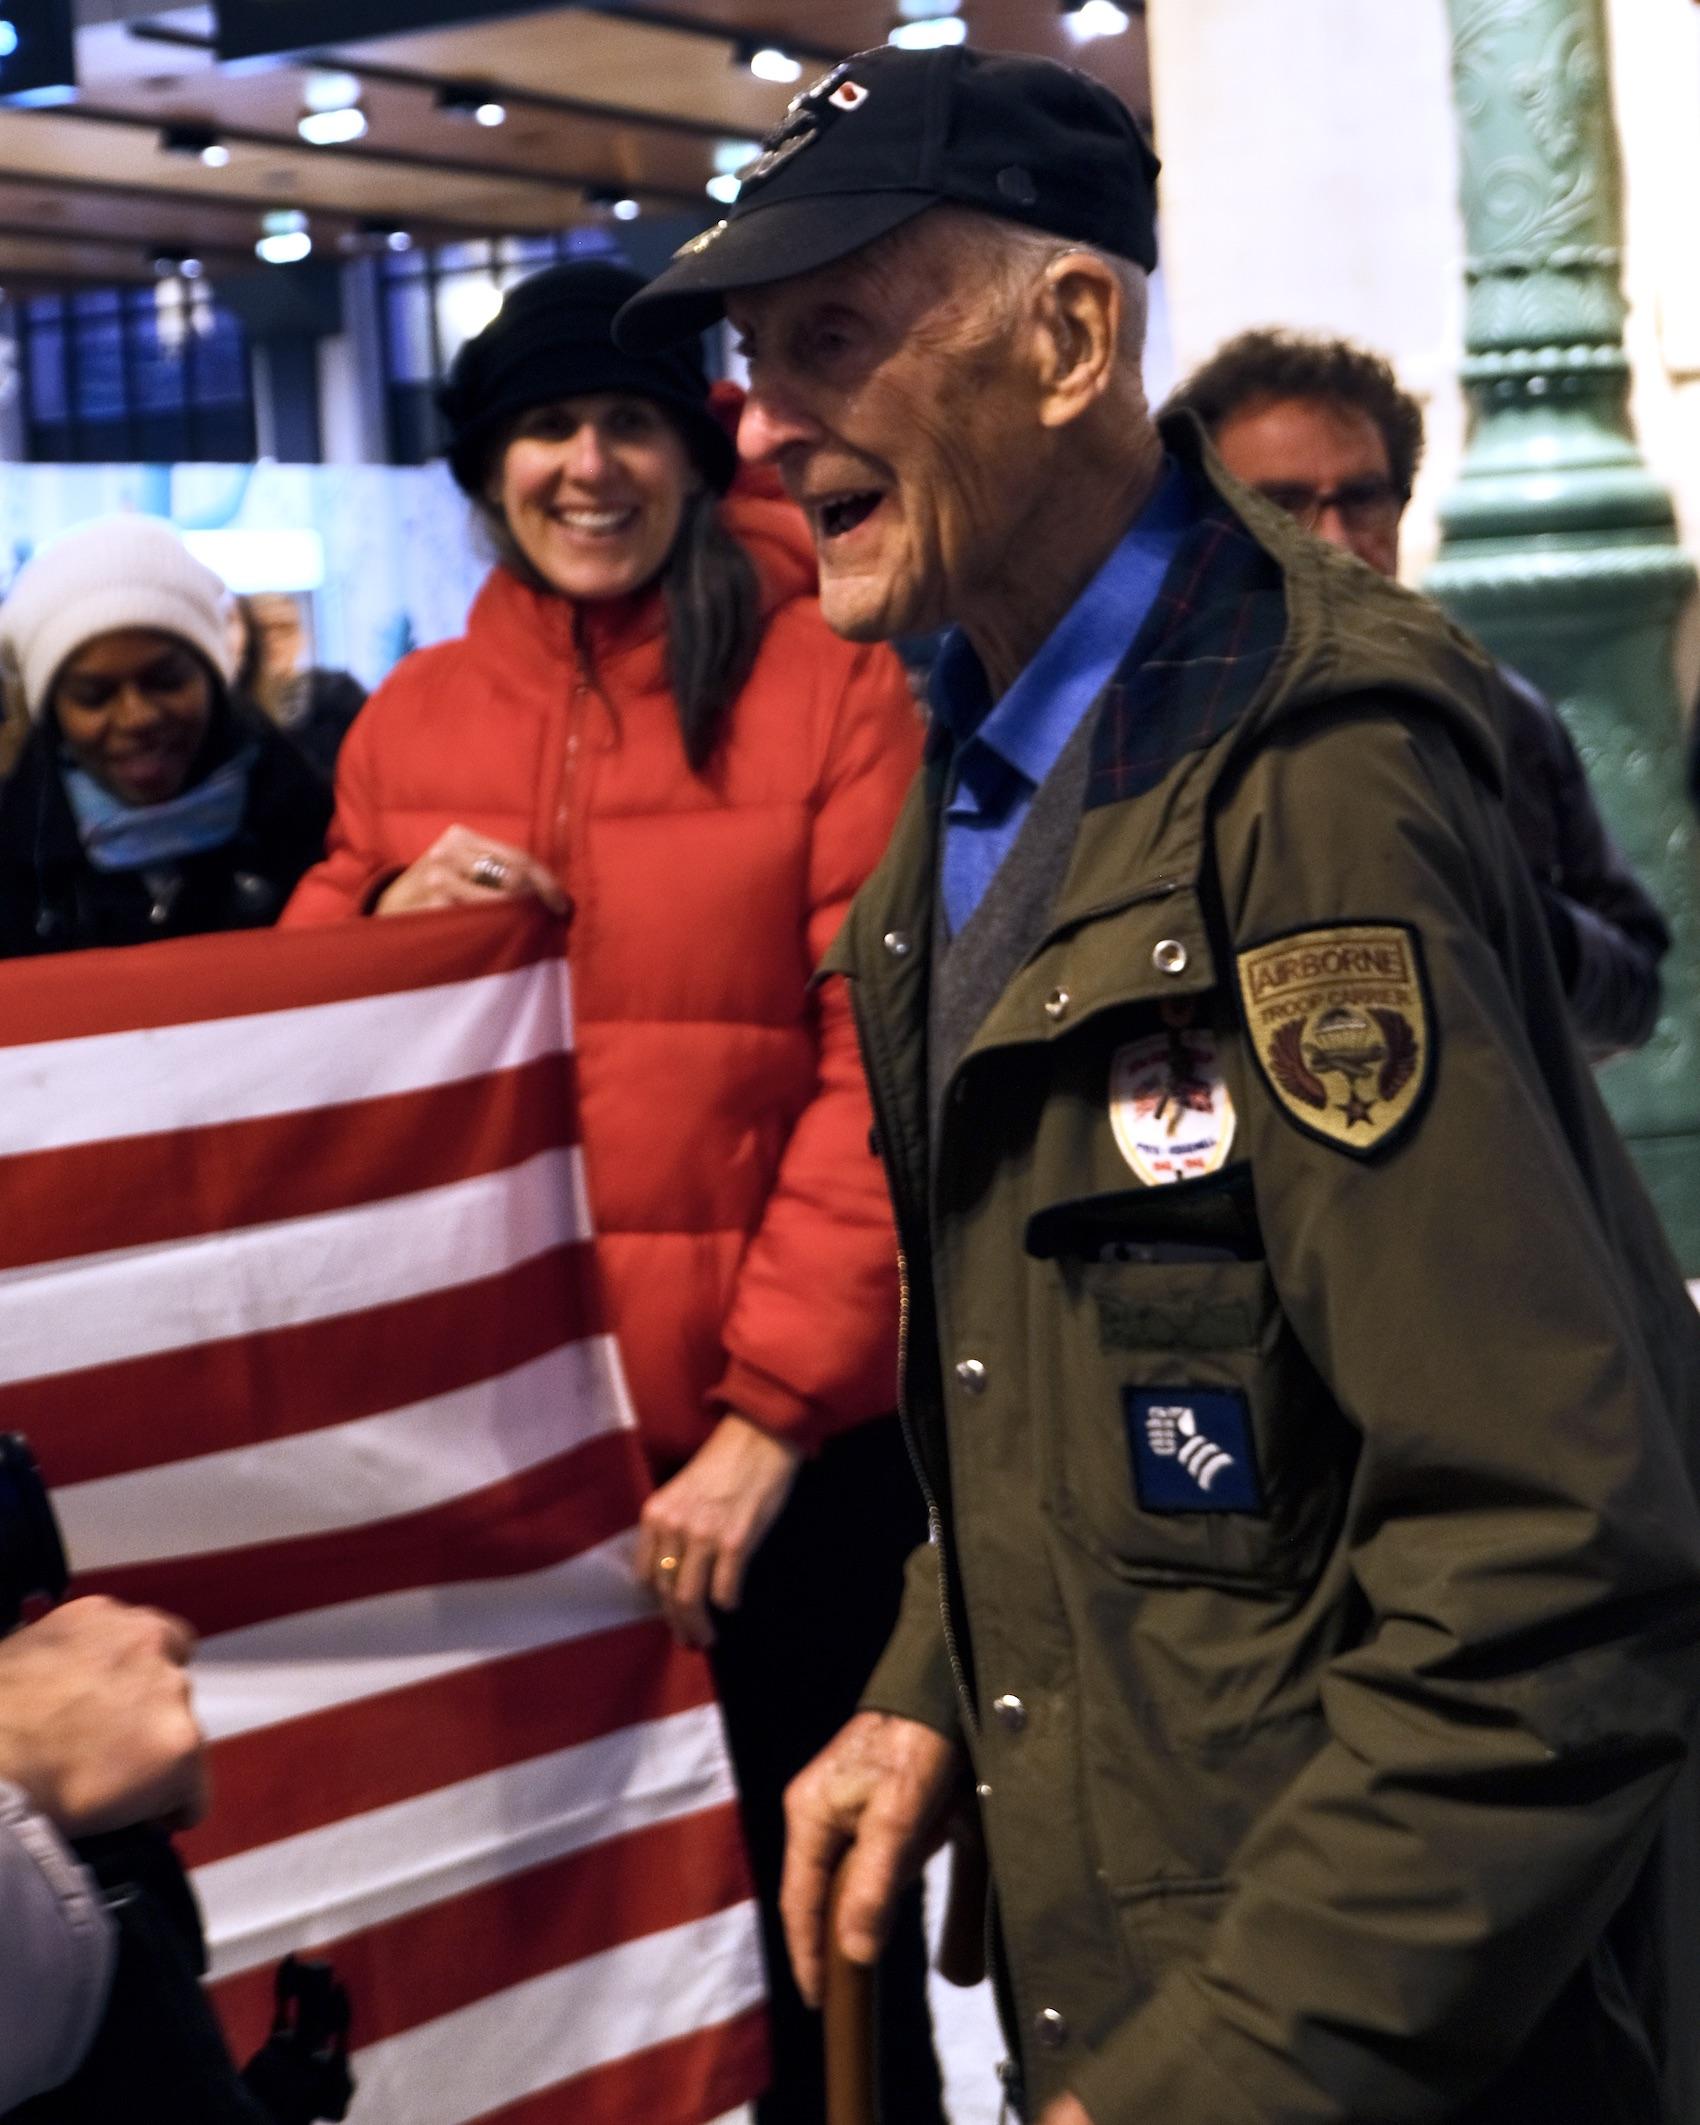 WWII Veteran Dr. Stephen Weiss arriving at Paris' Gare du Nord